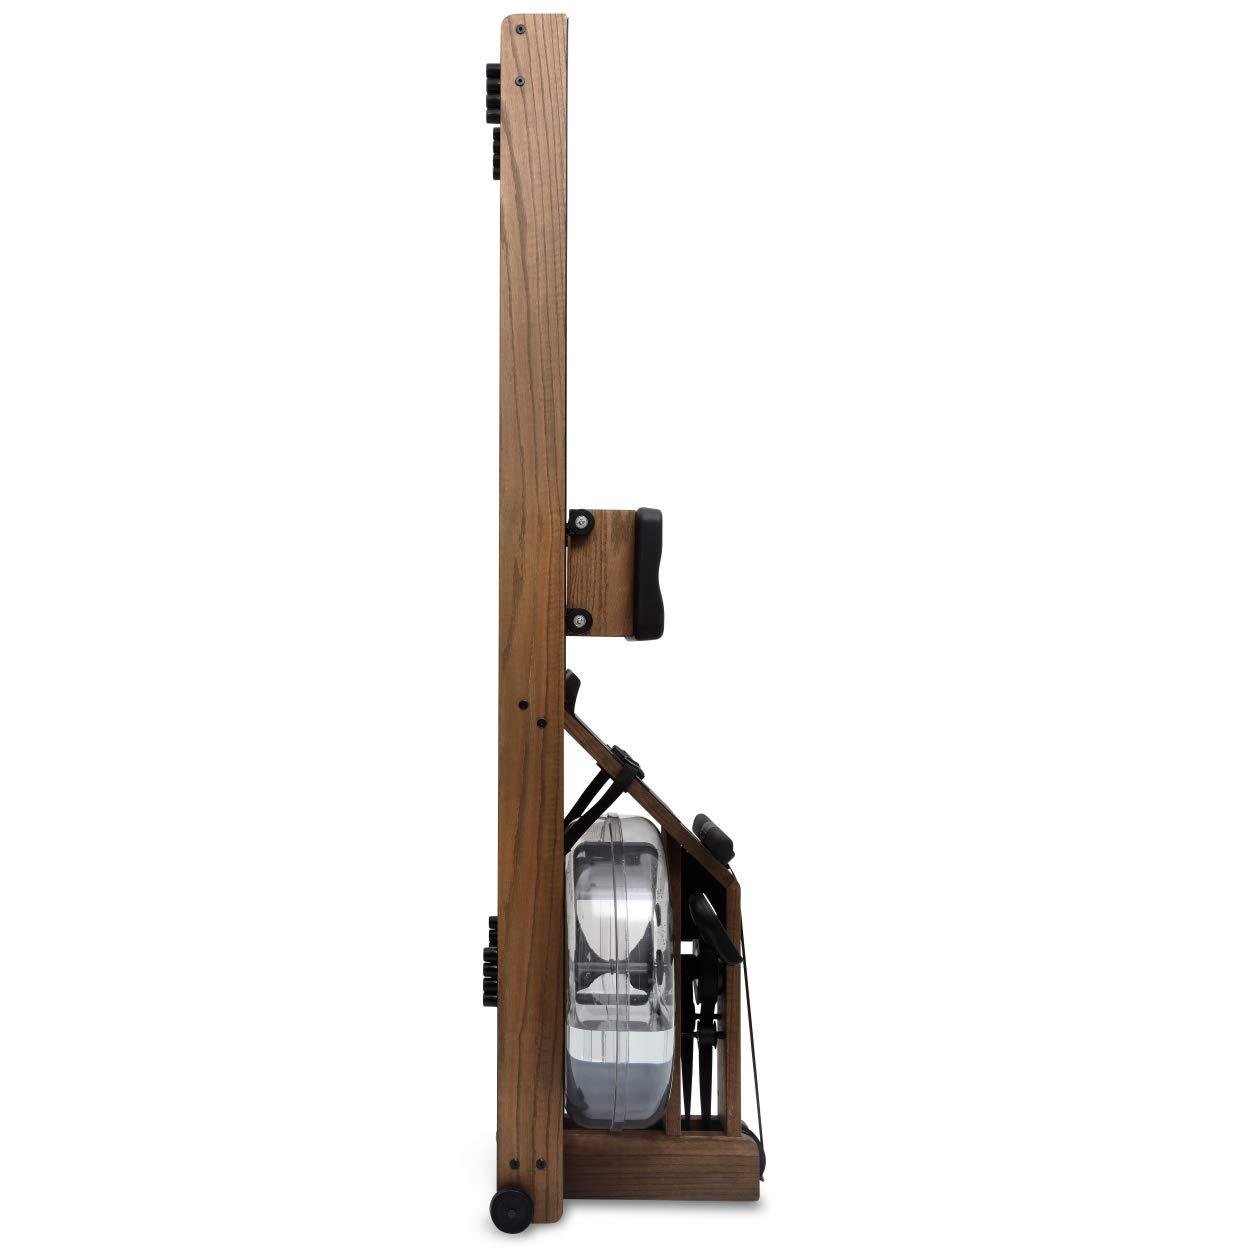 WaterRower Vintage Oak Rowing Machine with S4 by WaterRower (Image #2)